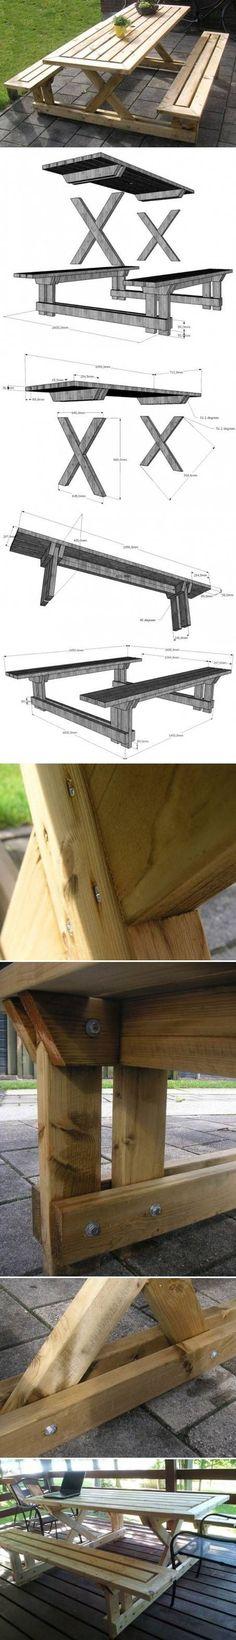 DIY Garden Bench and Table DIY Projects / UsefulDIY.com